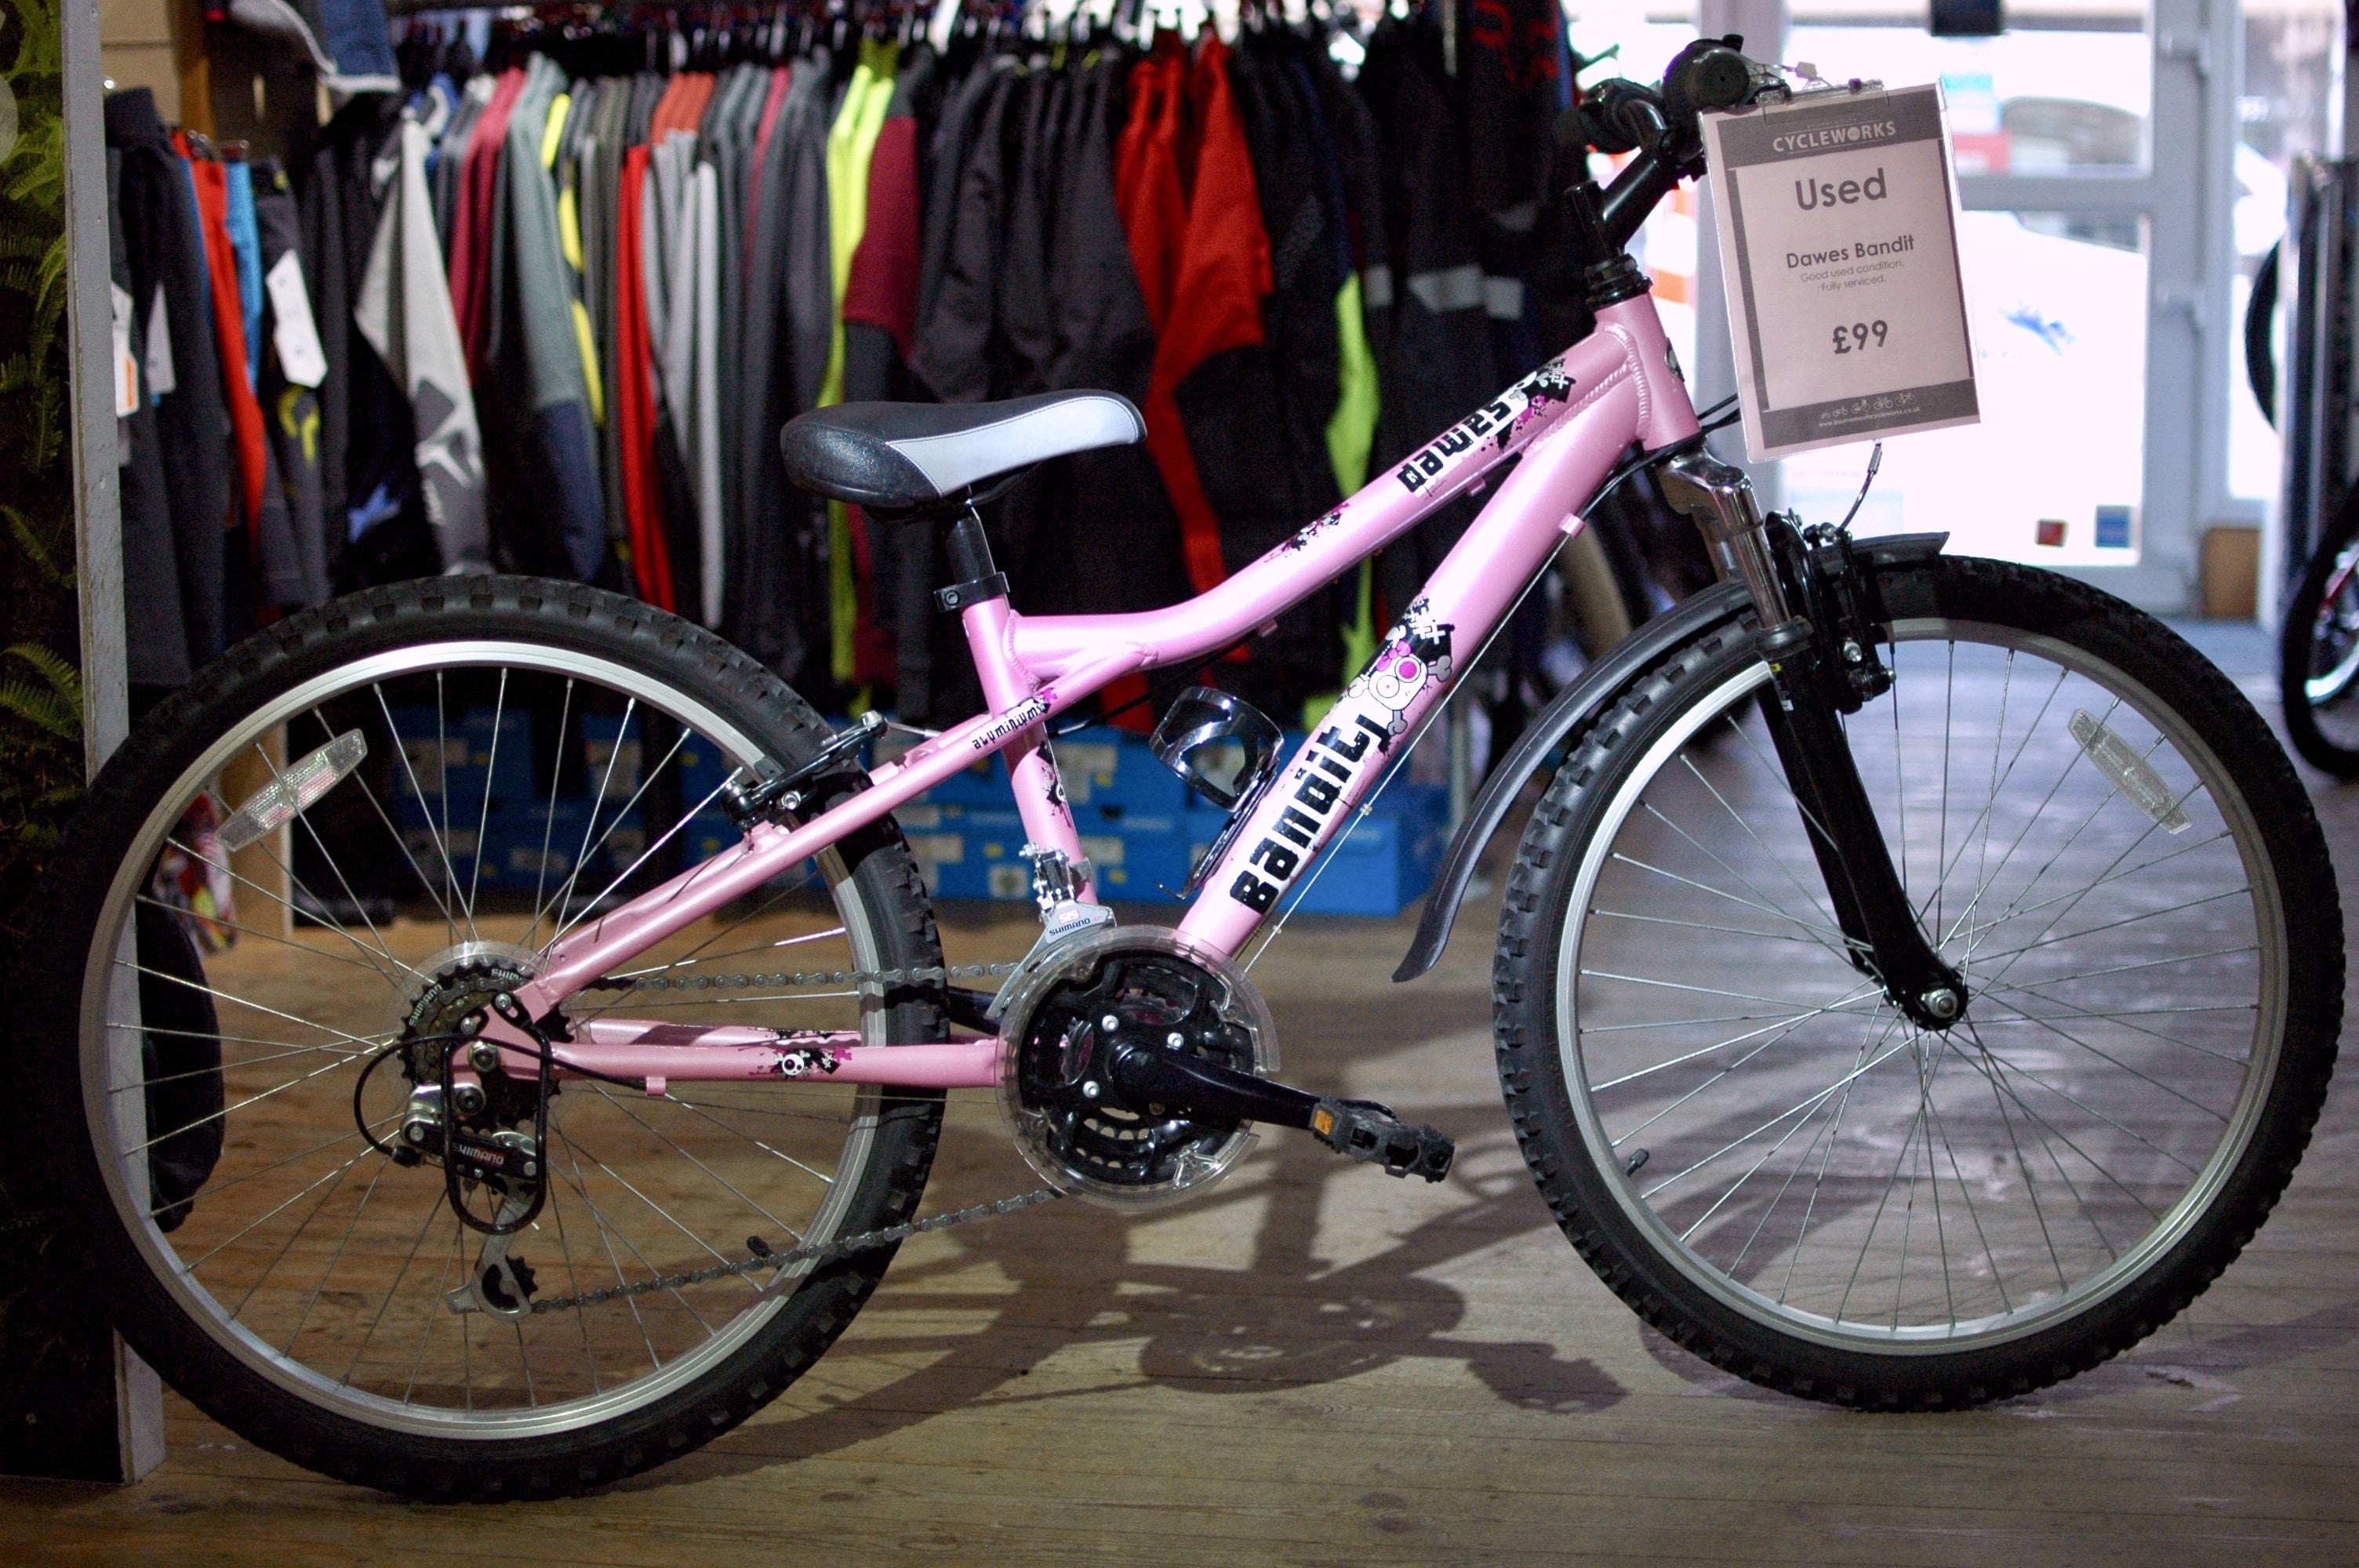 Used Bike - Dawes Bandit Pink - £99